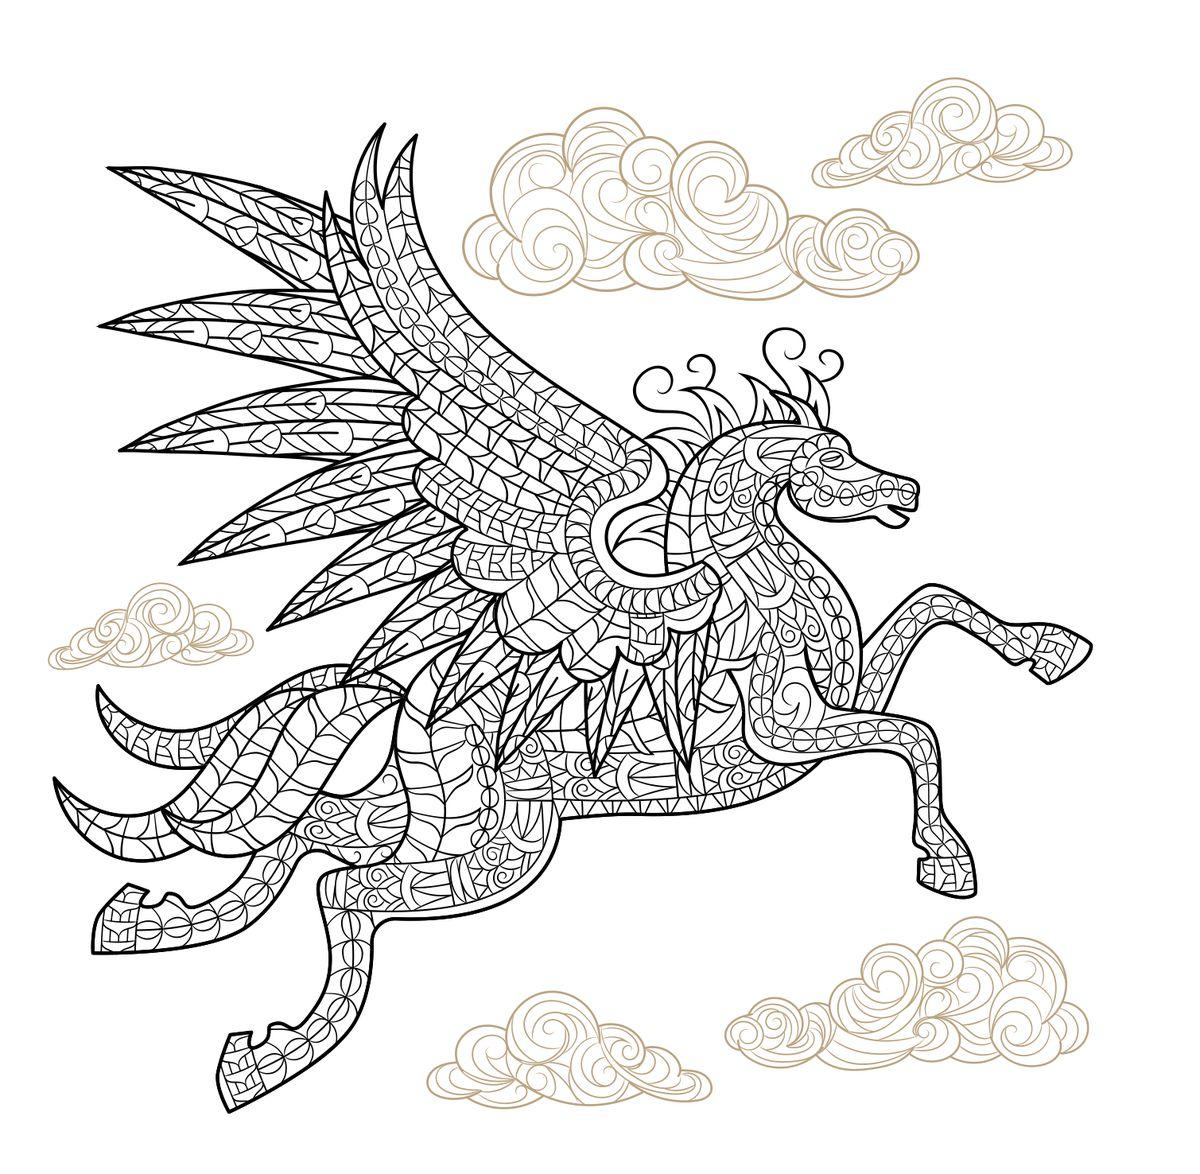 Pegasus winged horse adult coloring page ЛошадьКоньОлень